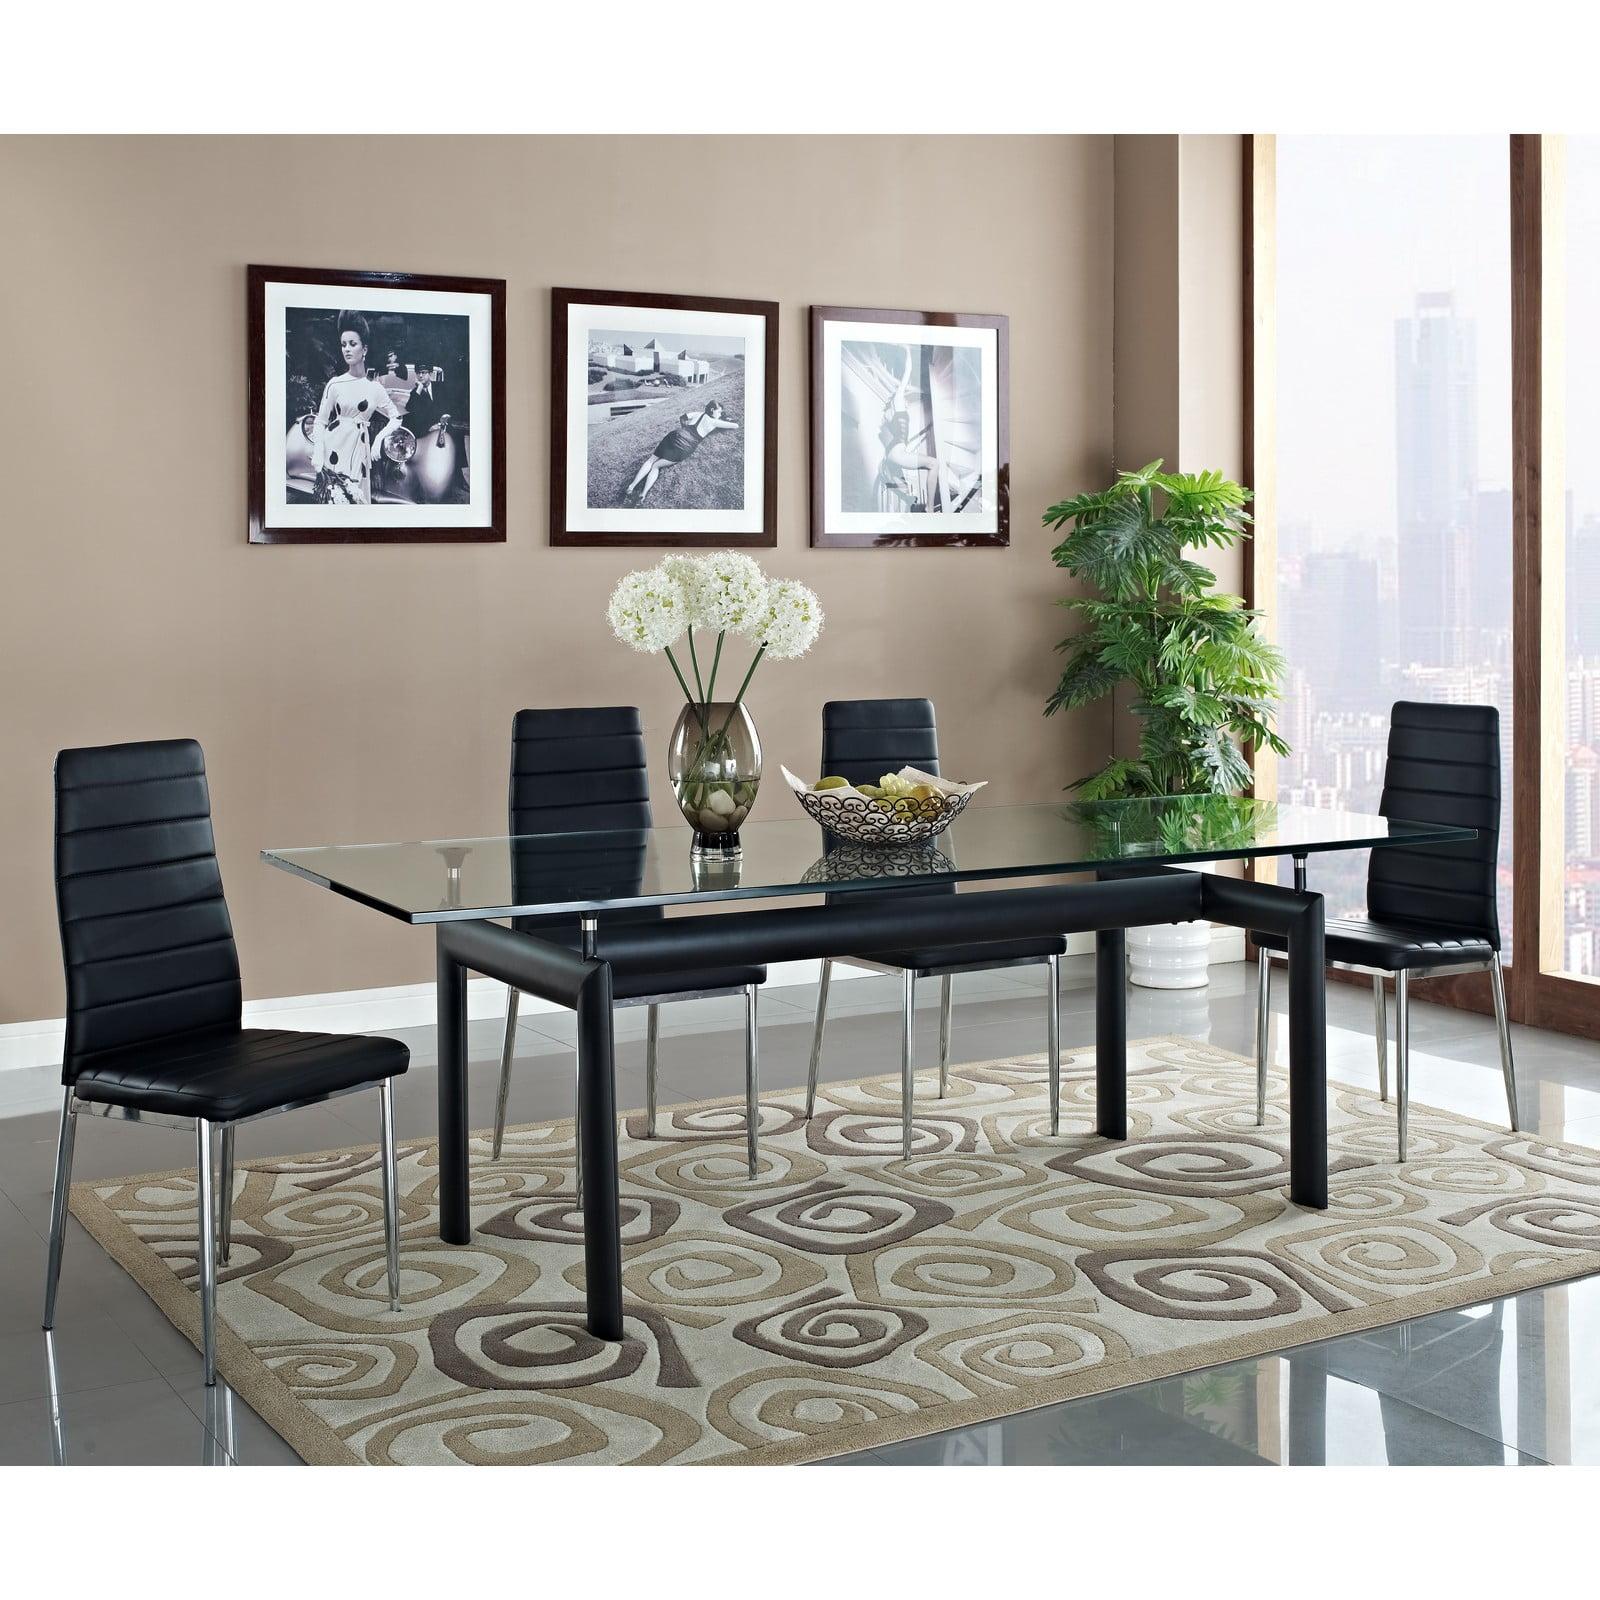 lc6 dining table furnishplus. Black Bedroom Furniture Sets. Home Design Ideas